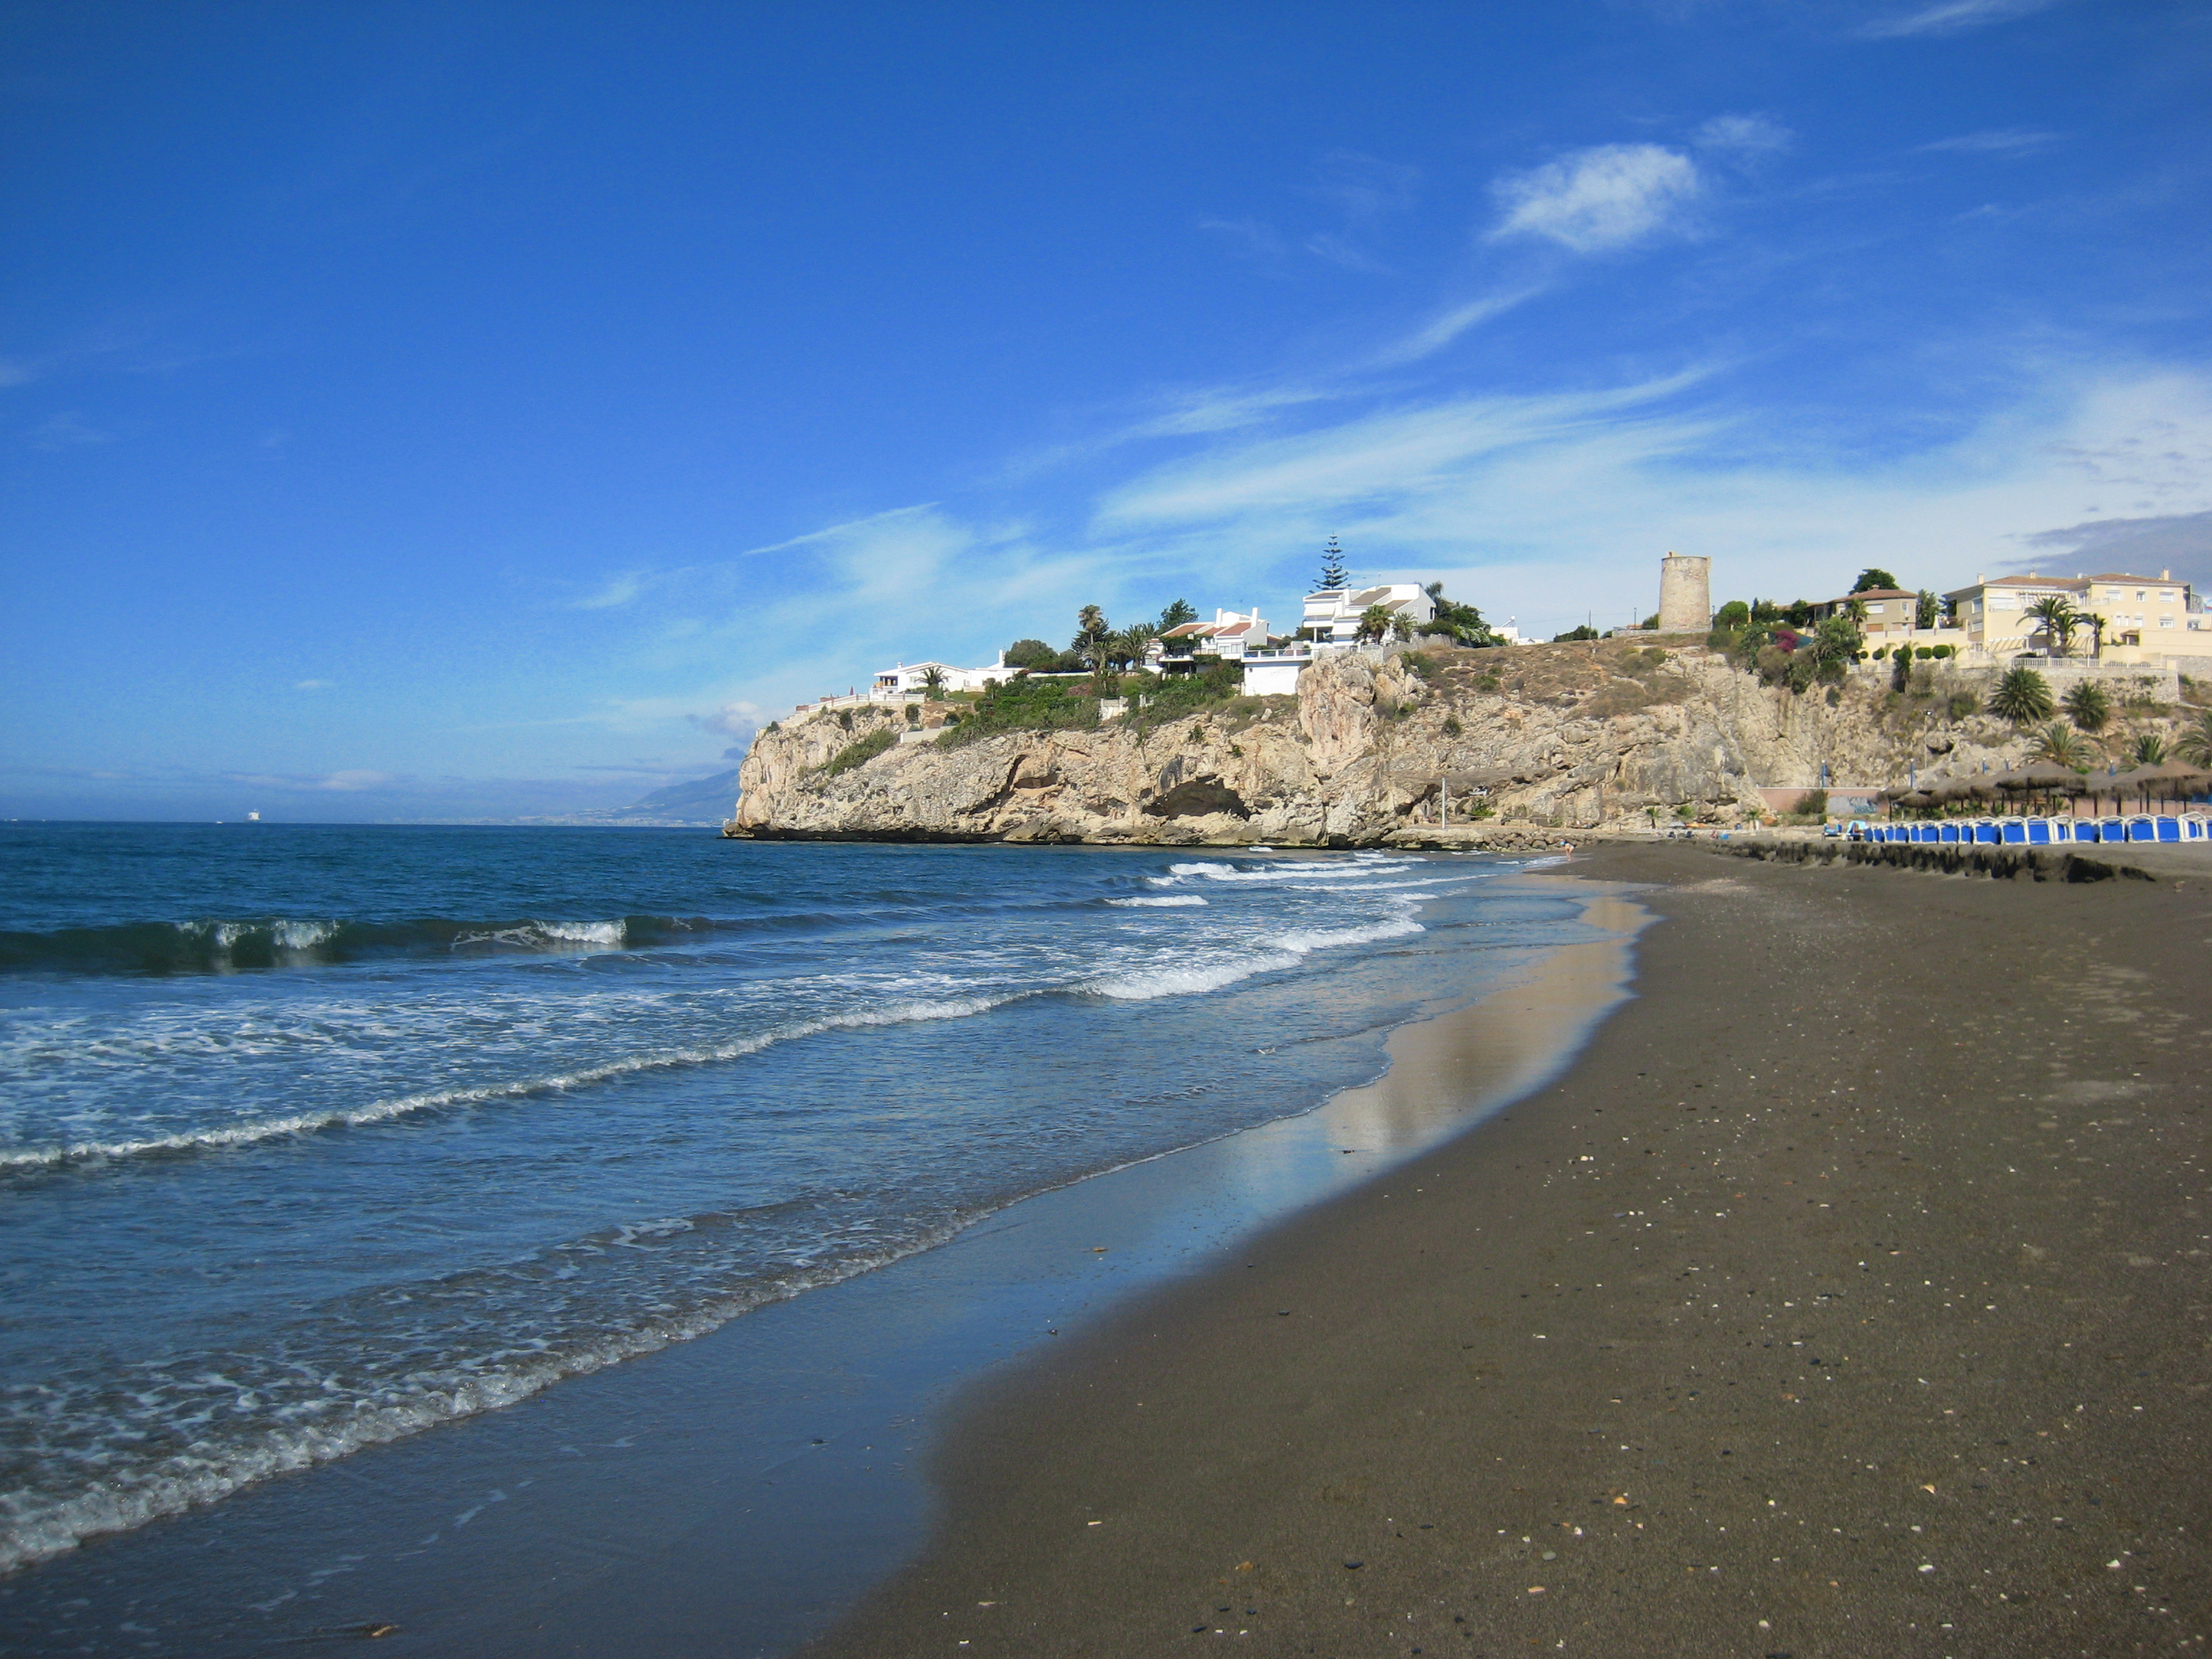 costa del sol - travel destination